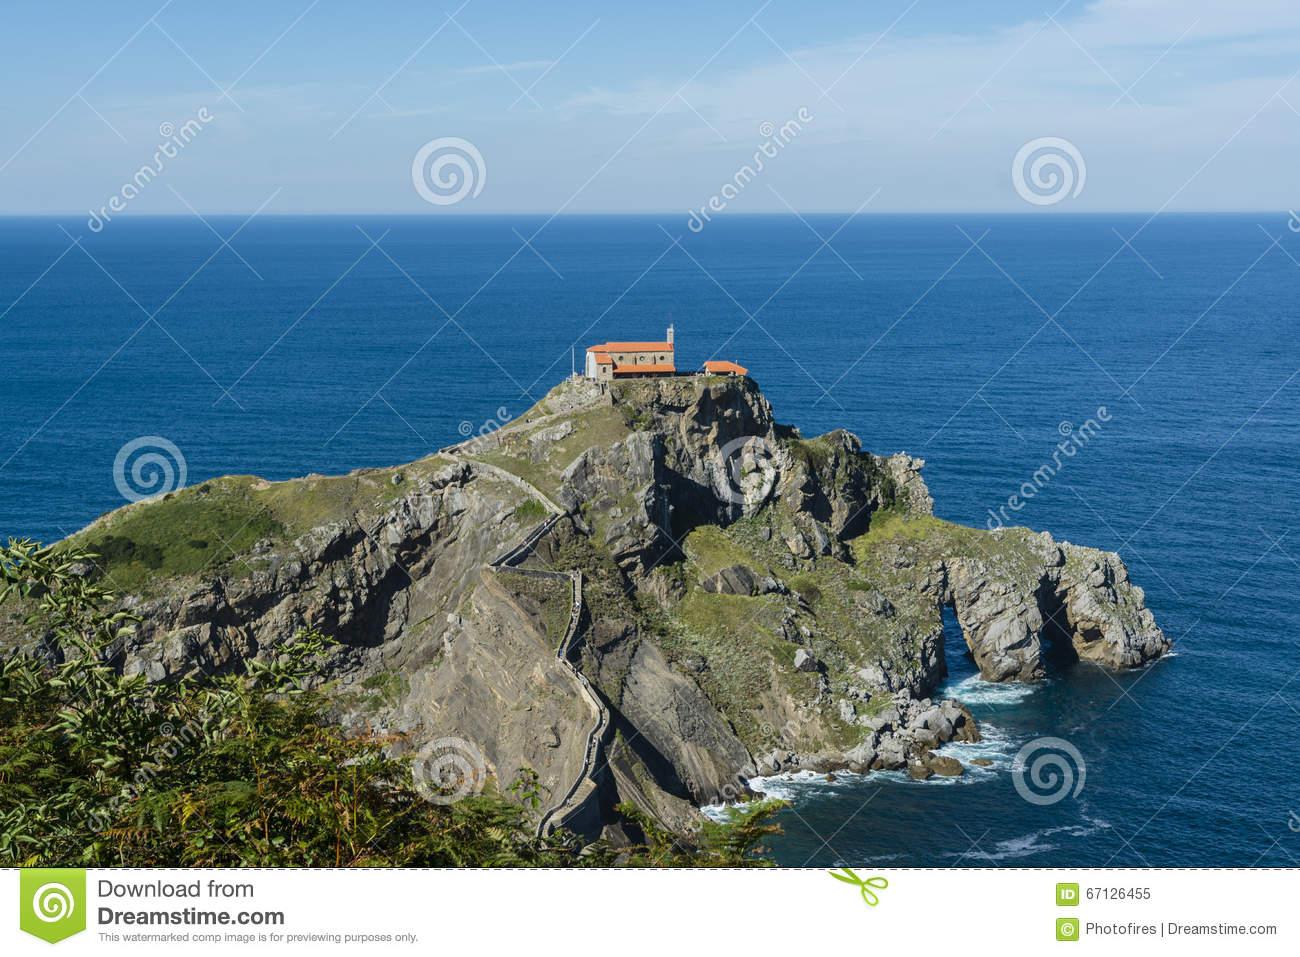 Islet clipart landform #7 Gaztelugatxe drawings clipart Gaztelugatxe